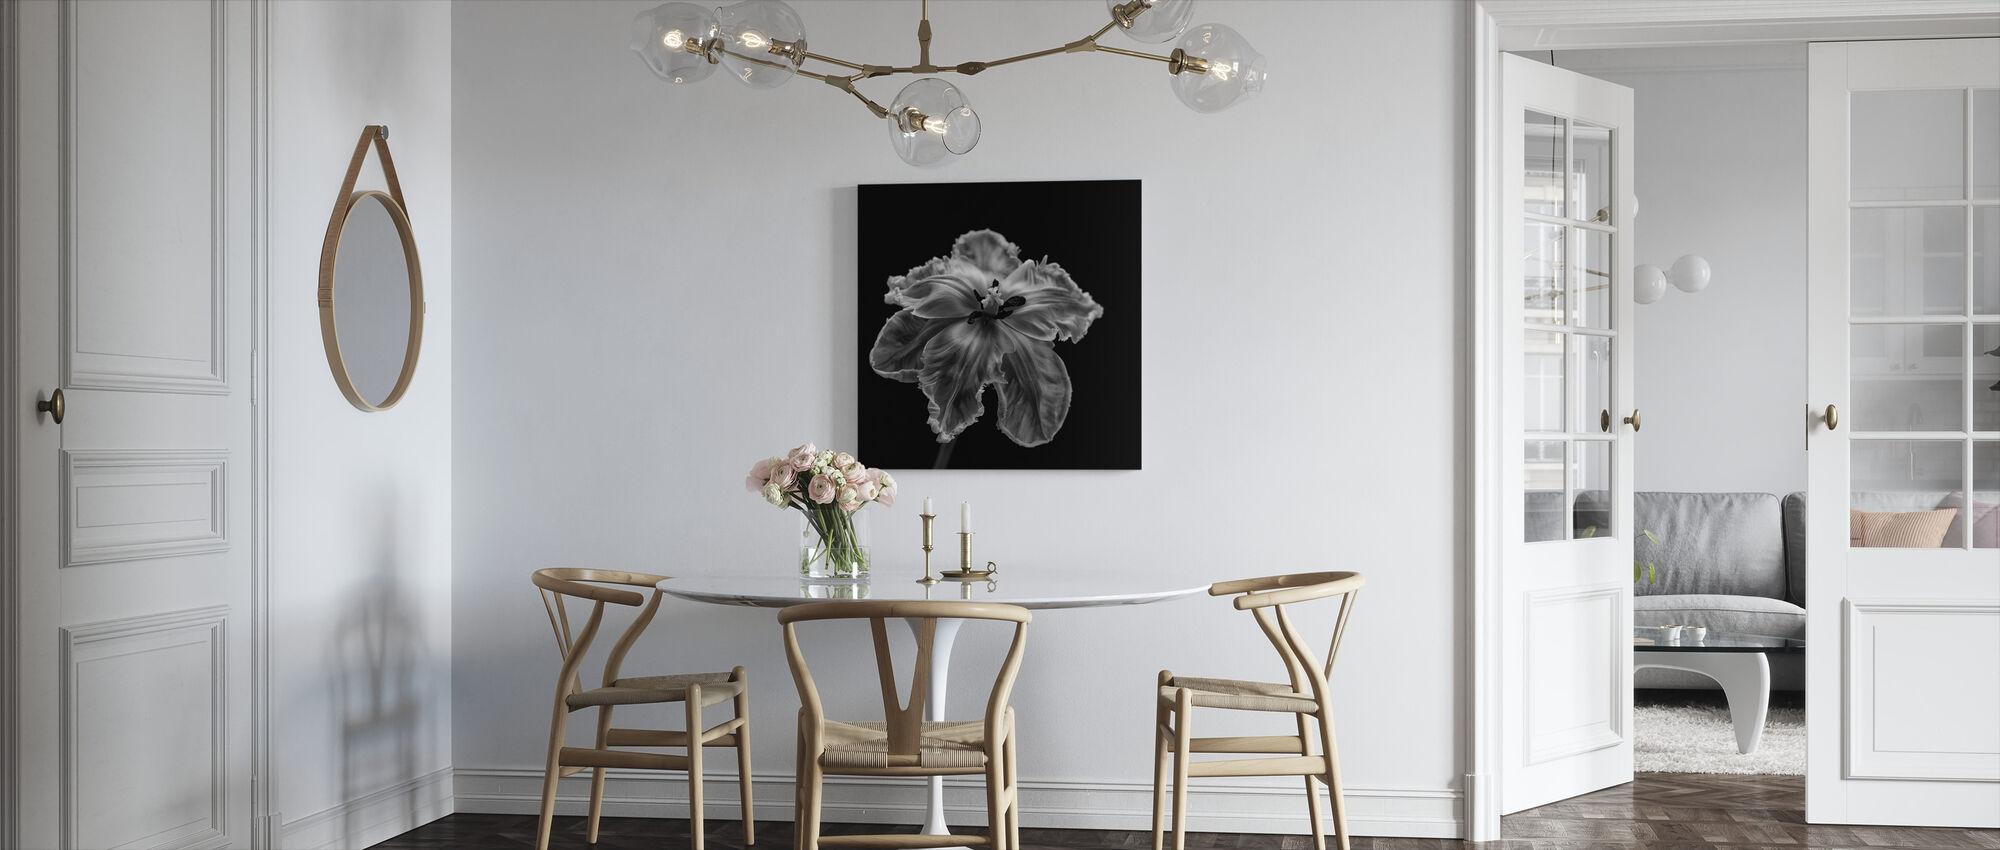 Black and White Parrot Tulip - Canvas print - Kitchen